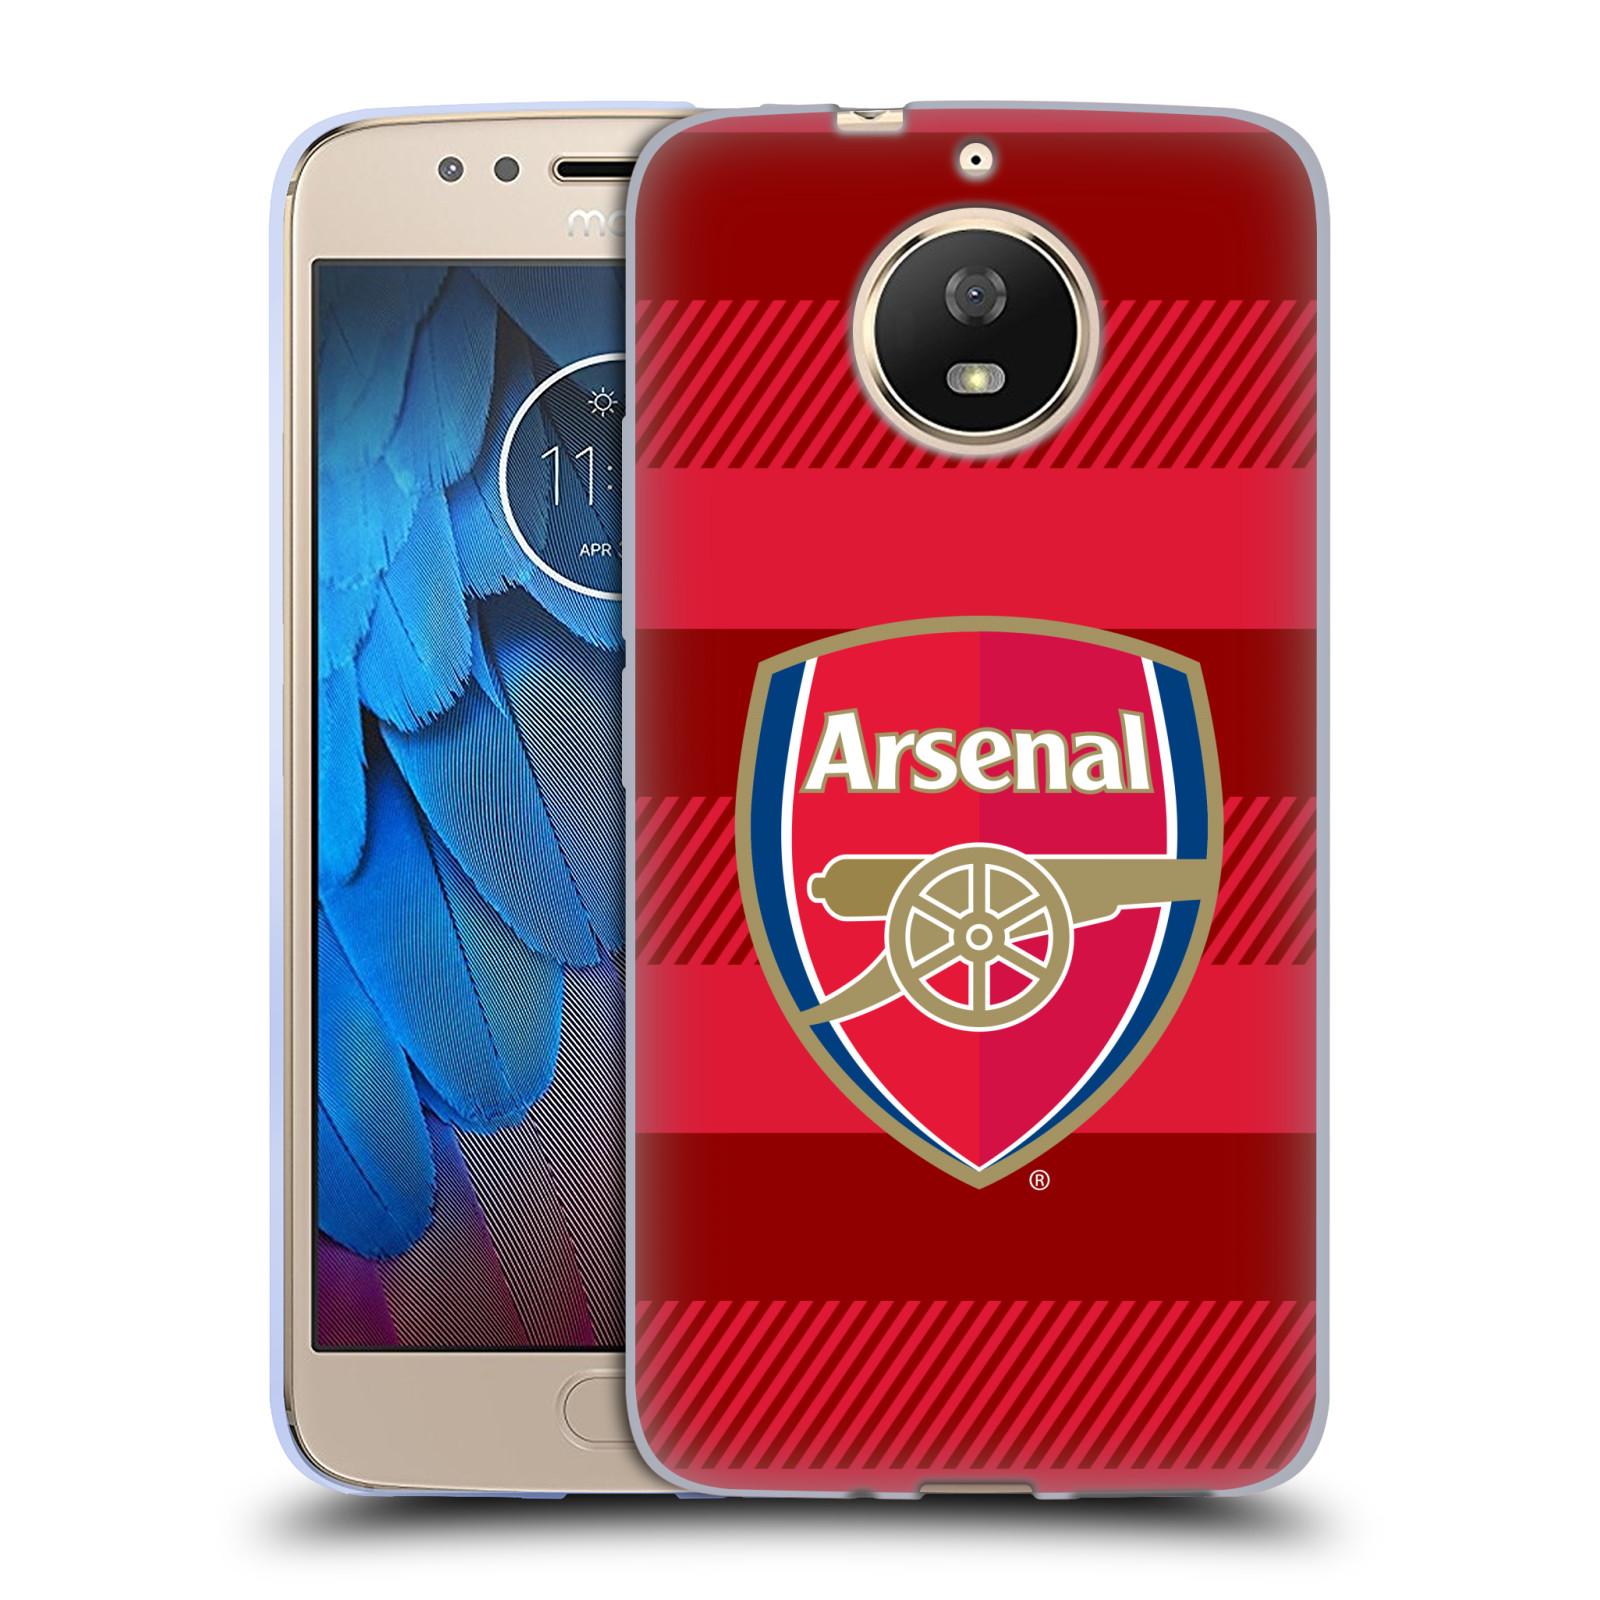 Silikonové pouzdro na mobil Lenovo Moto G5s - Head Case - Arsenal FC - Logo s pruhy